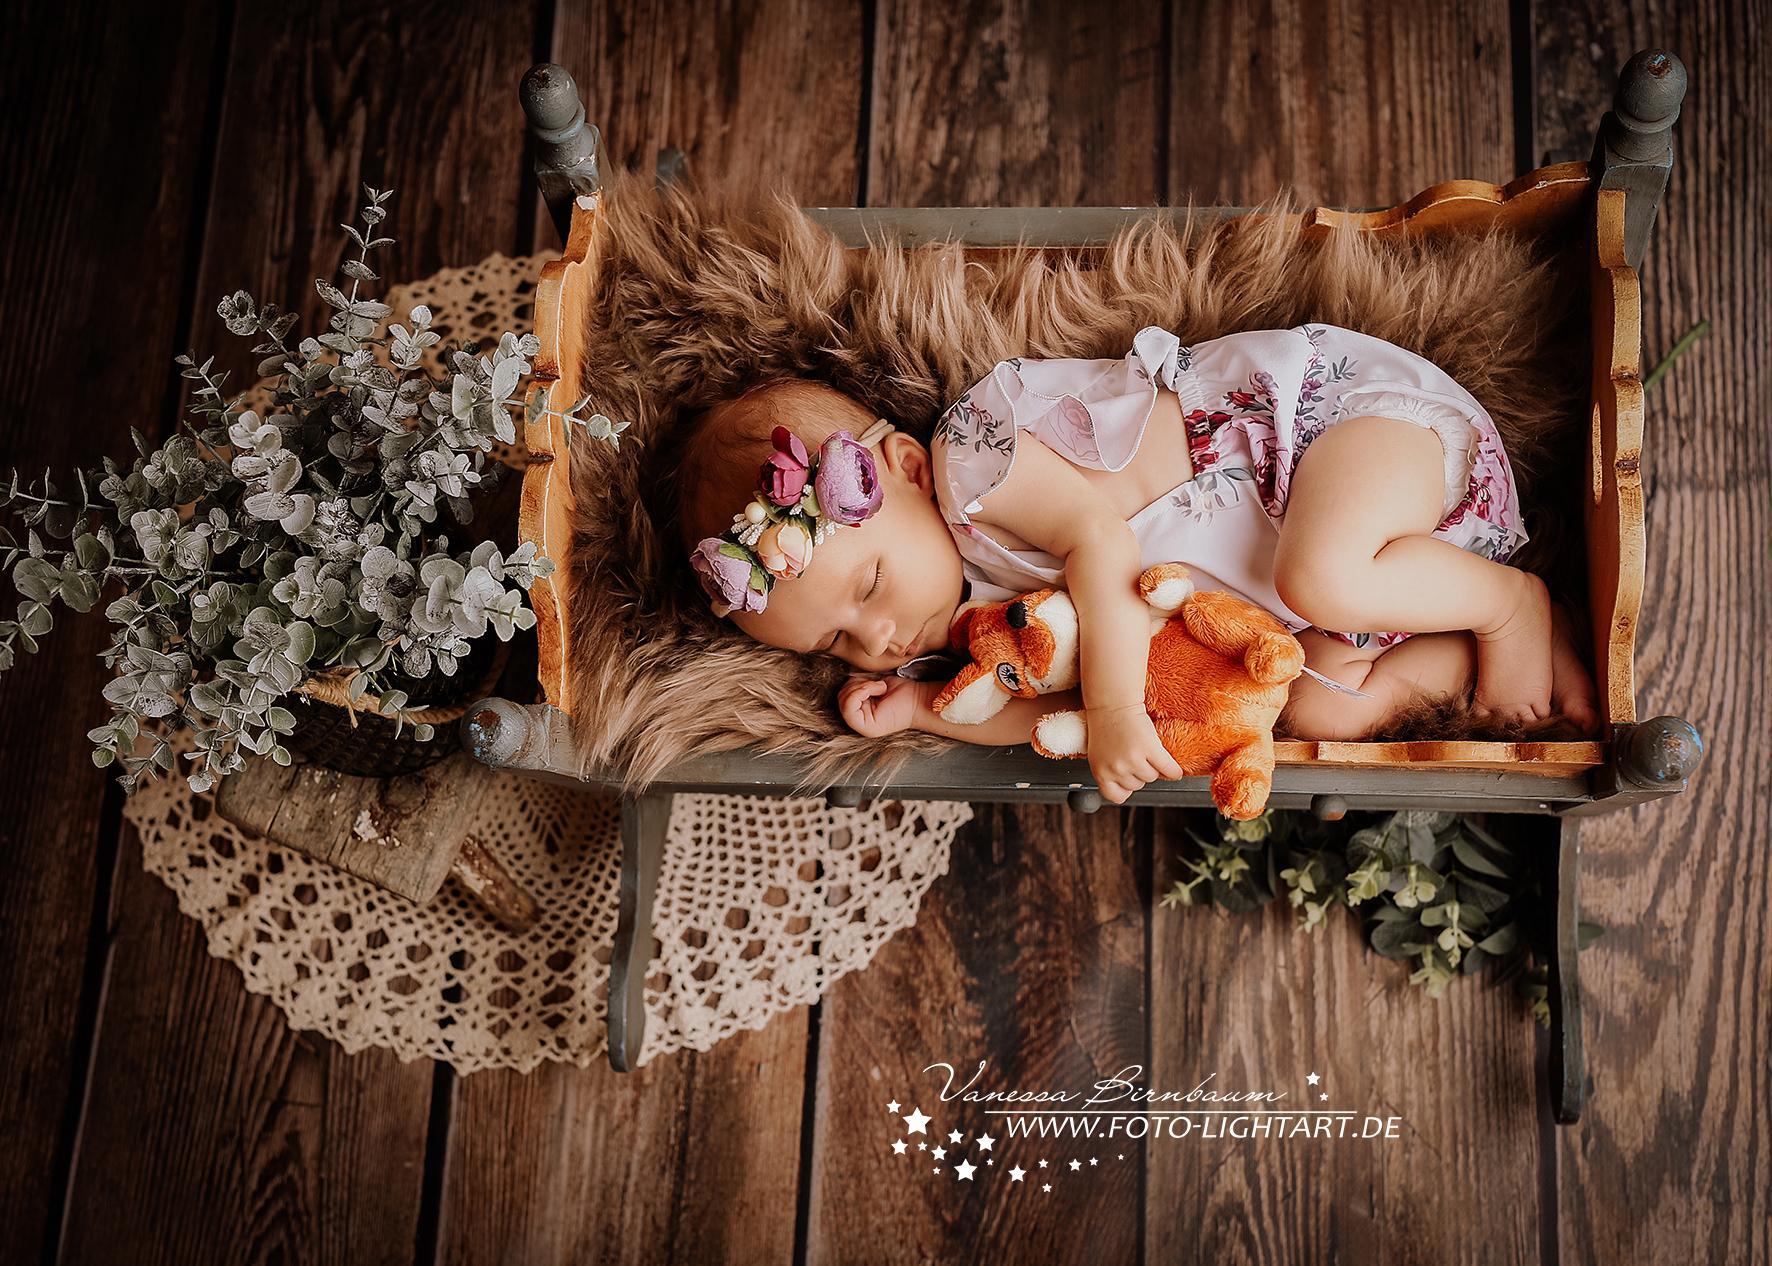 Vanessa Birnbaum - FotoLightart Baby Neugeboren 4